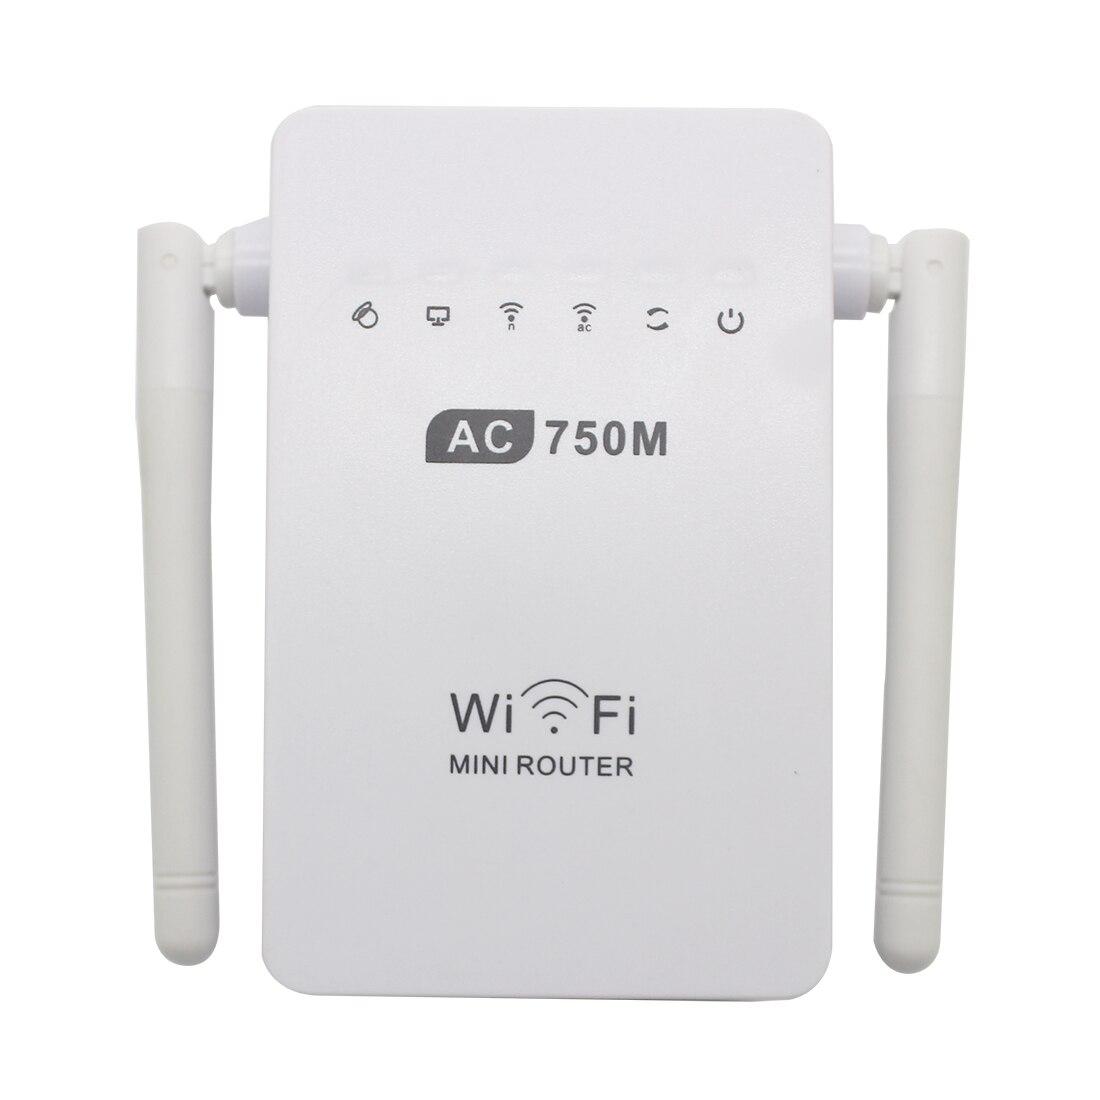 NOYOKERE Hot Sale 750Mbps Antenna Wifi Repeater Wireless Range Extender 802.11N Booster Signal Amplifier wlan EU